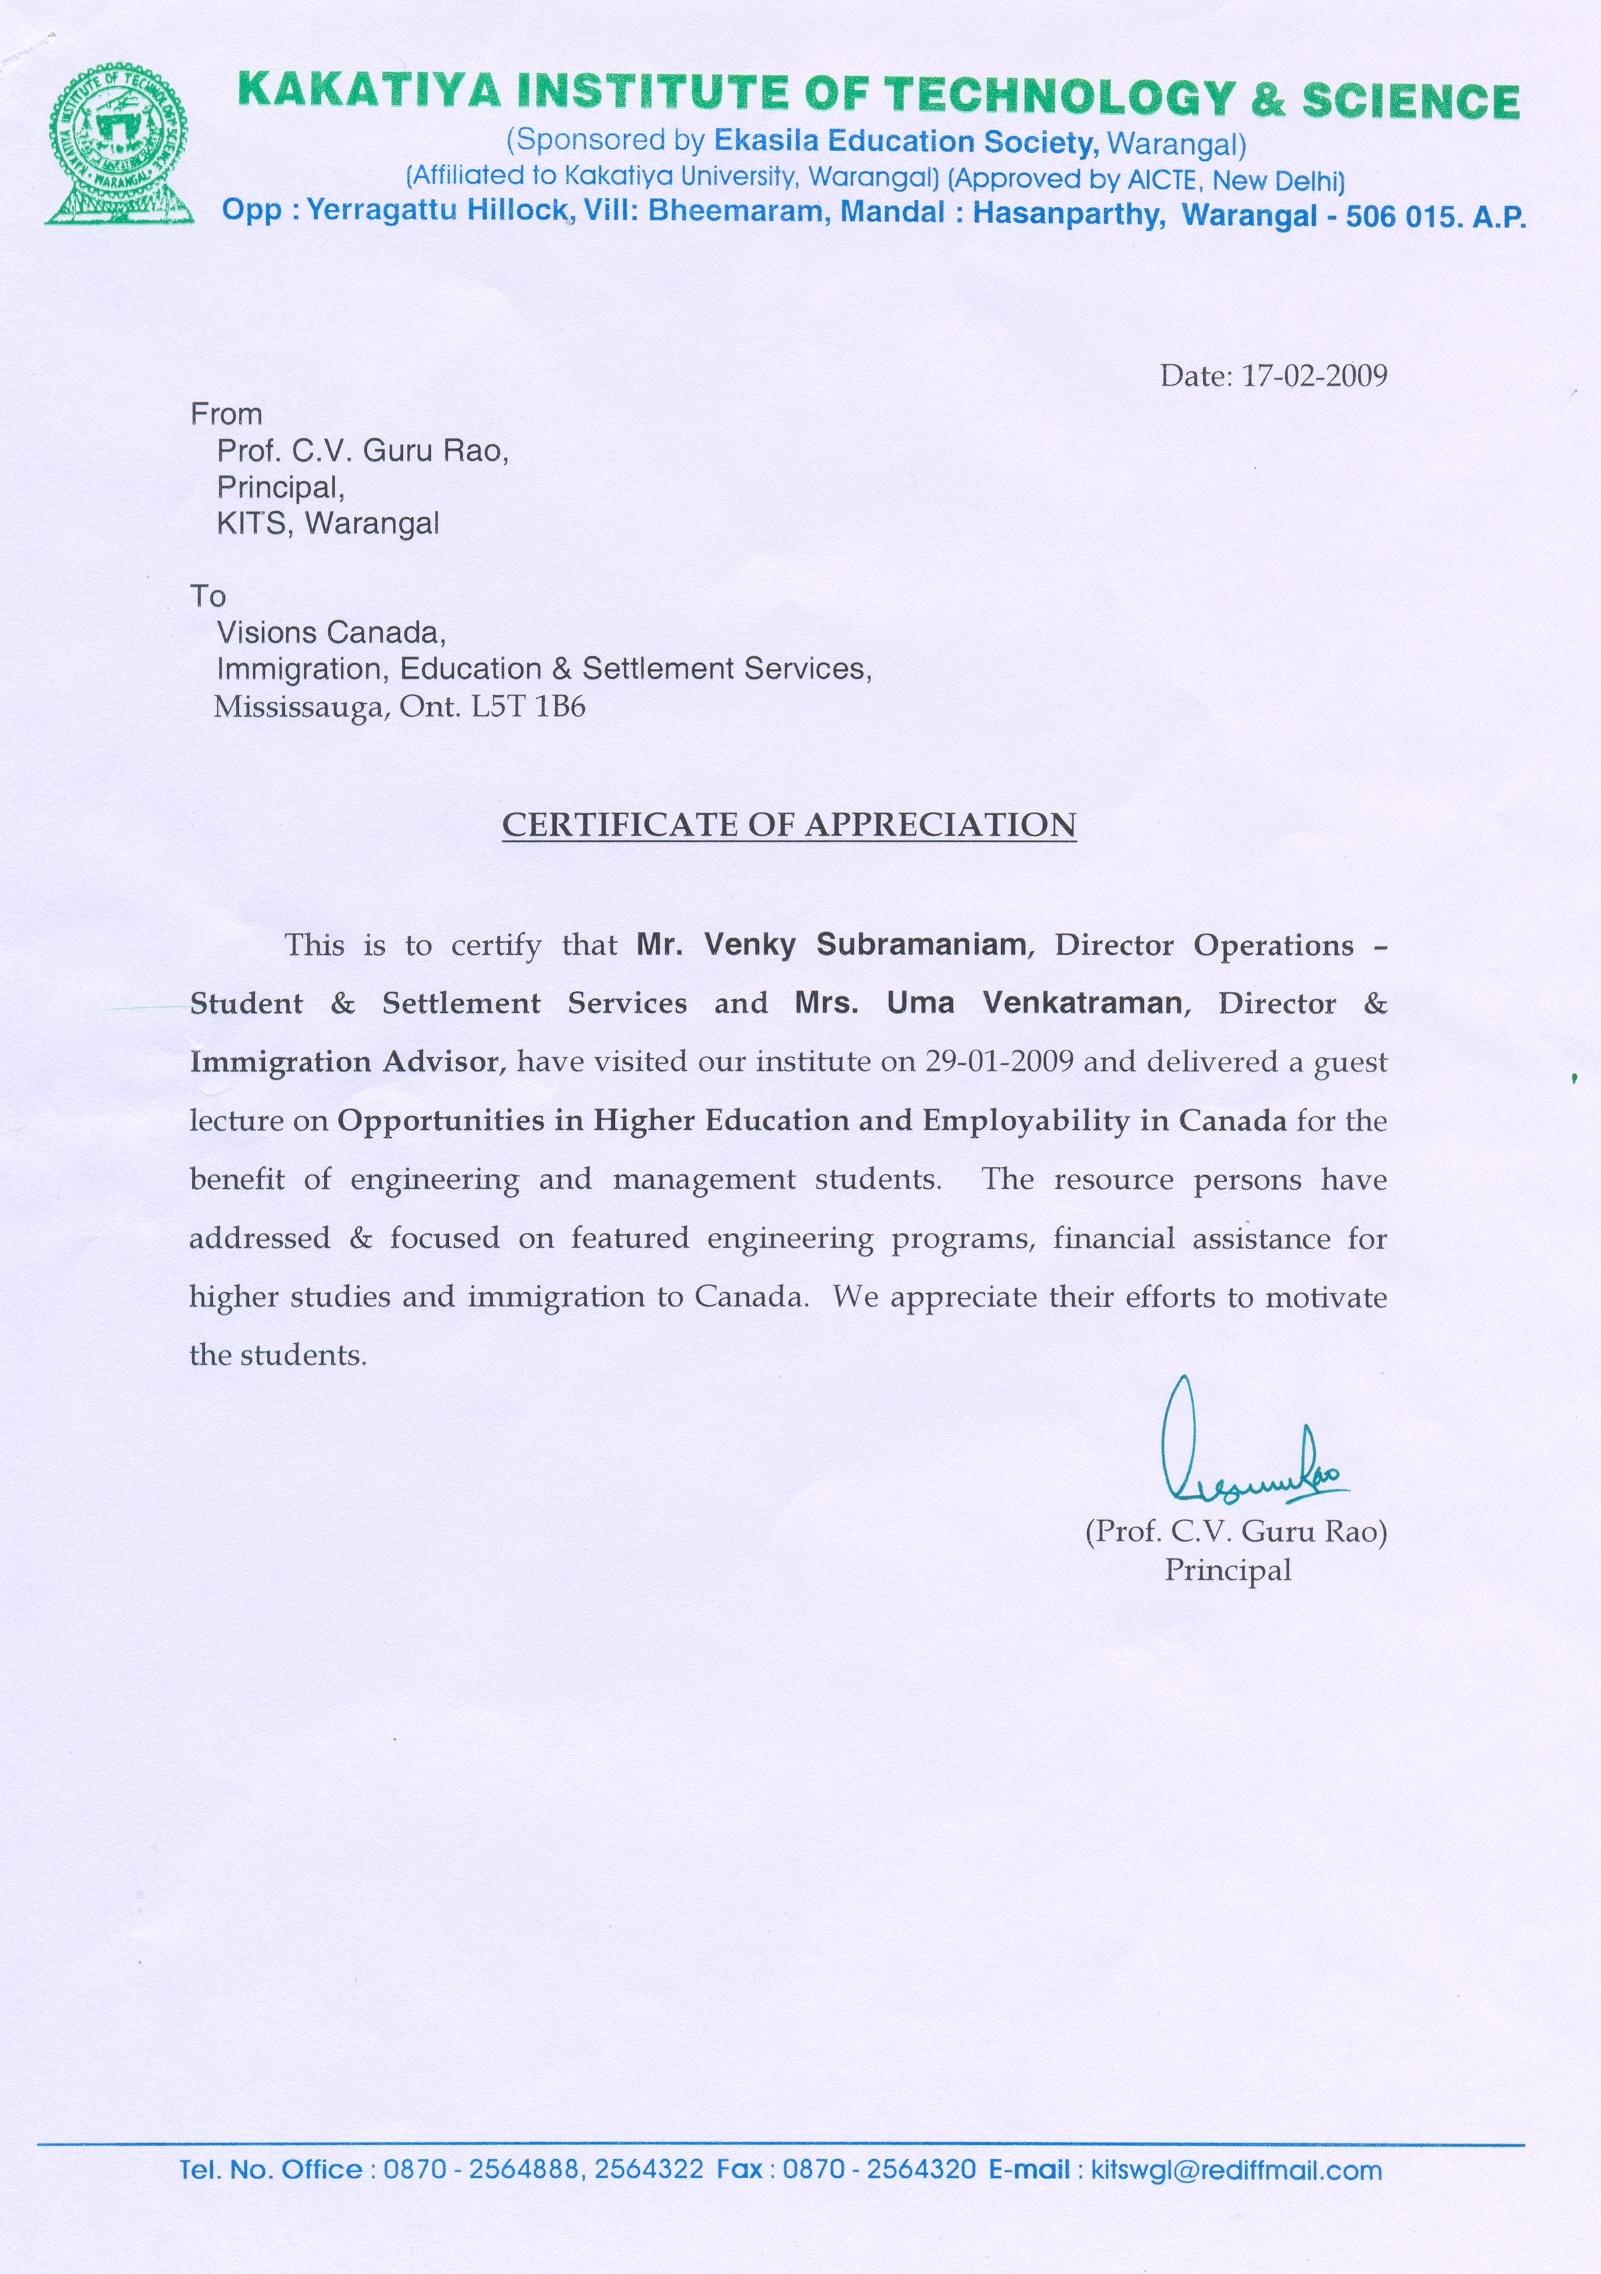 Appreciation letter from Mount Carmel School for DELF Junior